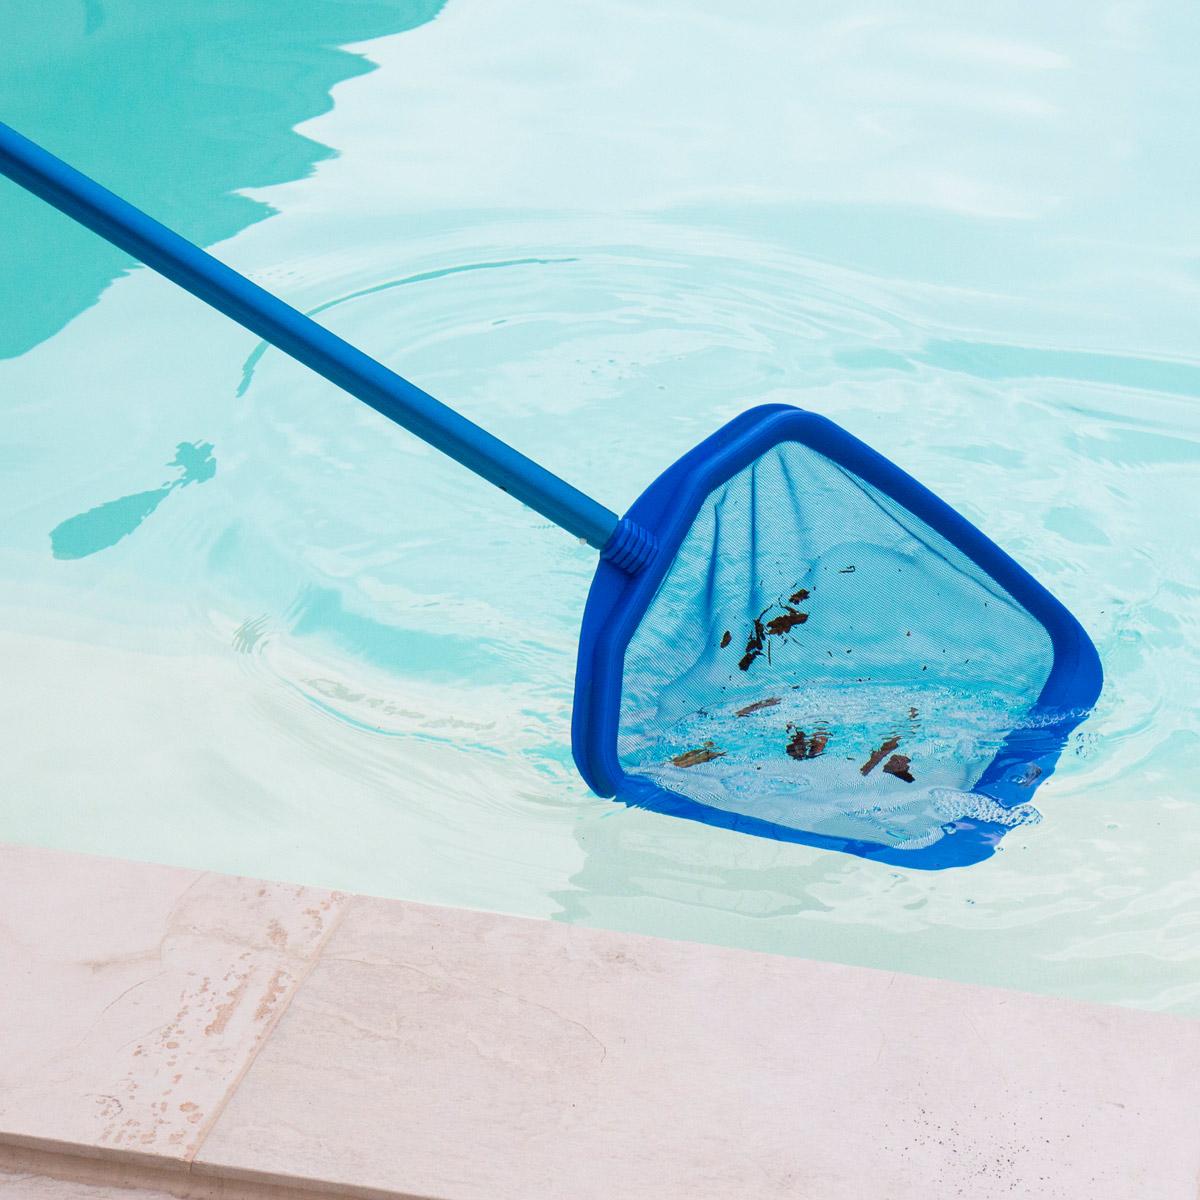 Pool zubeh r intex stutzenset propfenset siebgitter for Kescher pool obi